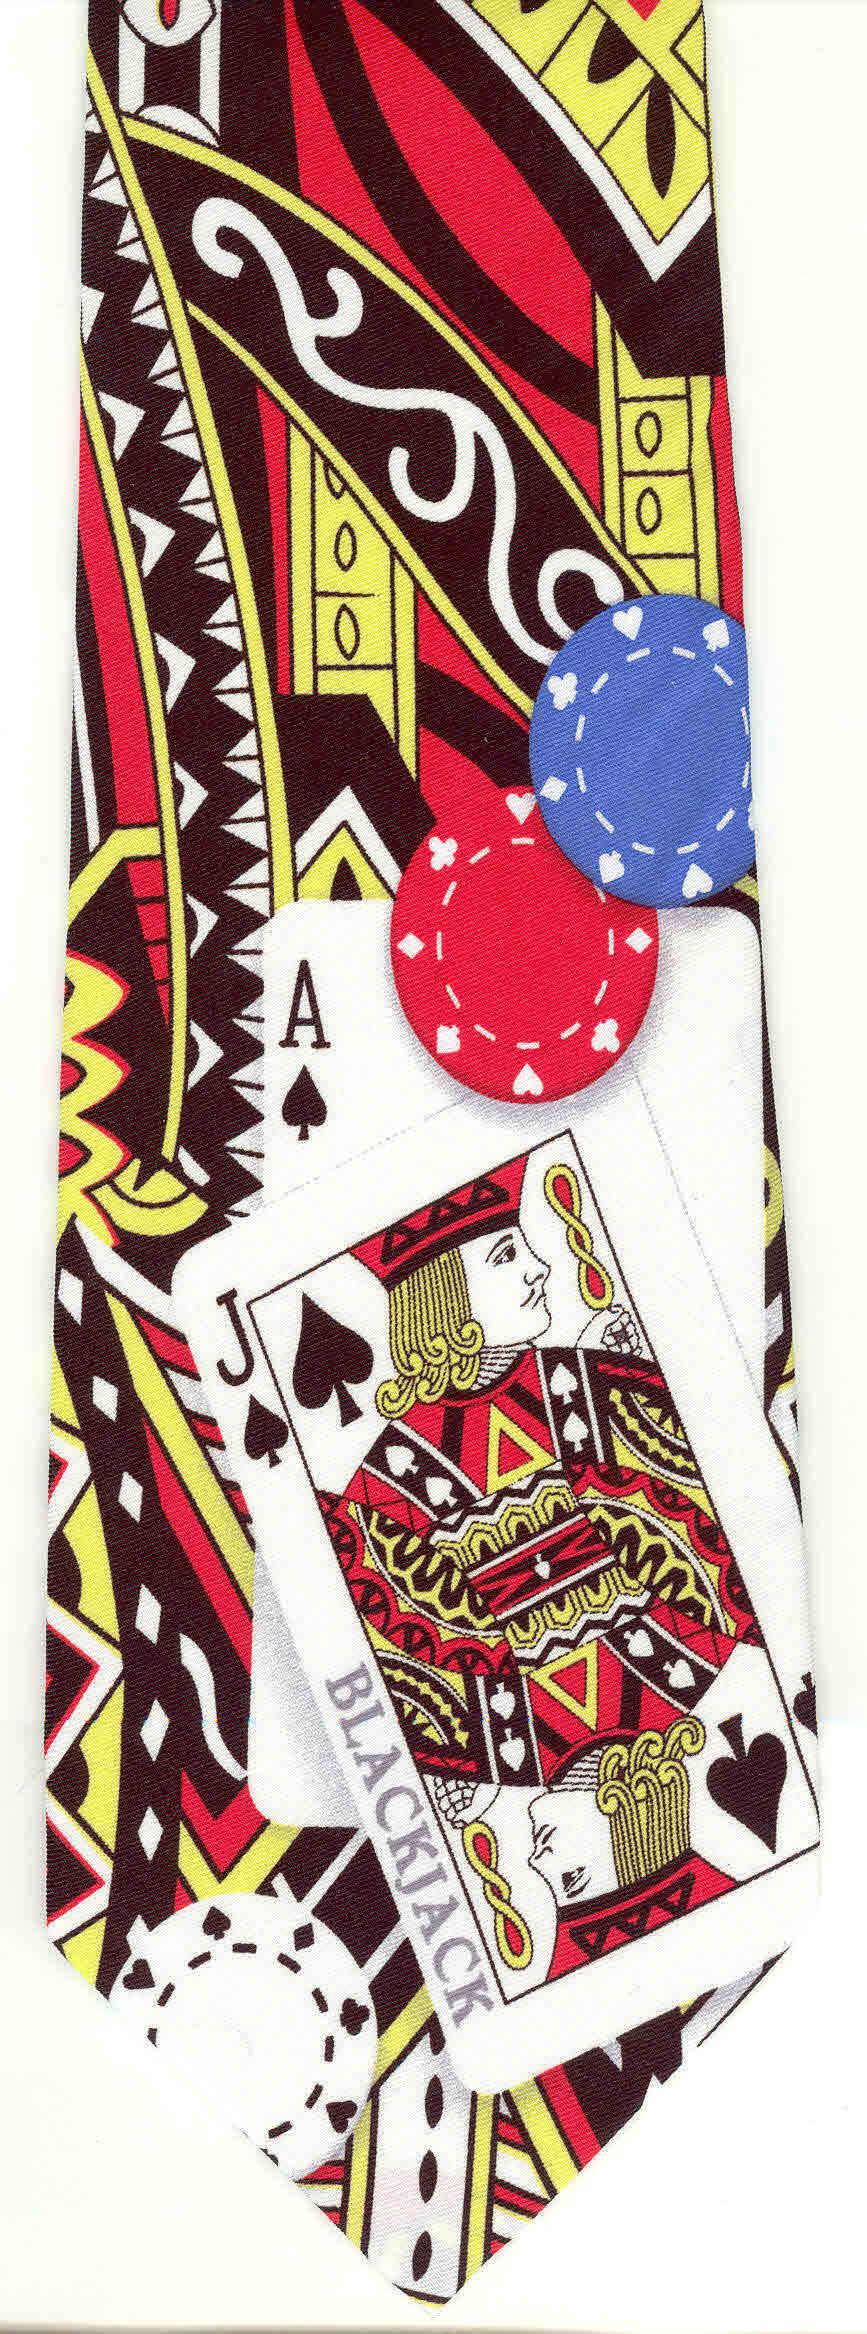 044 Blackjack.jpg